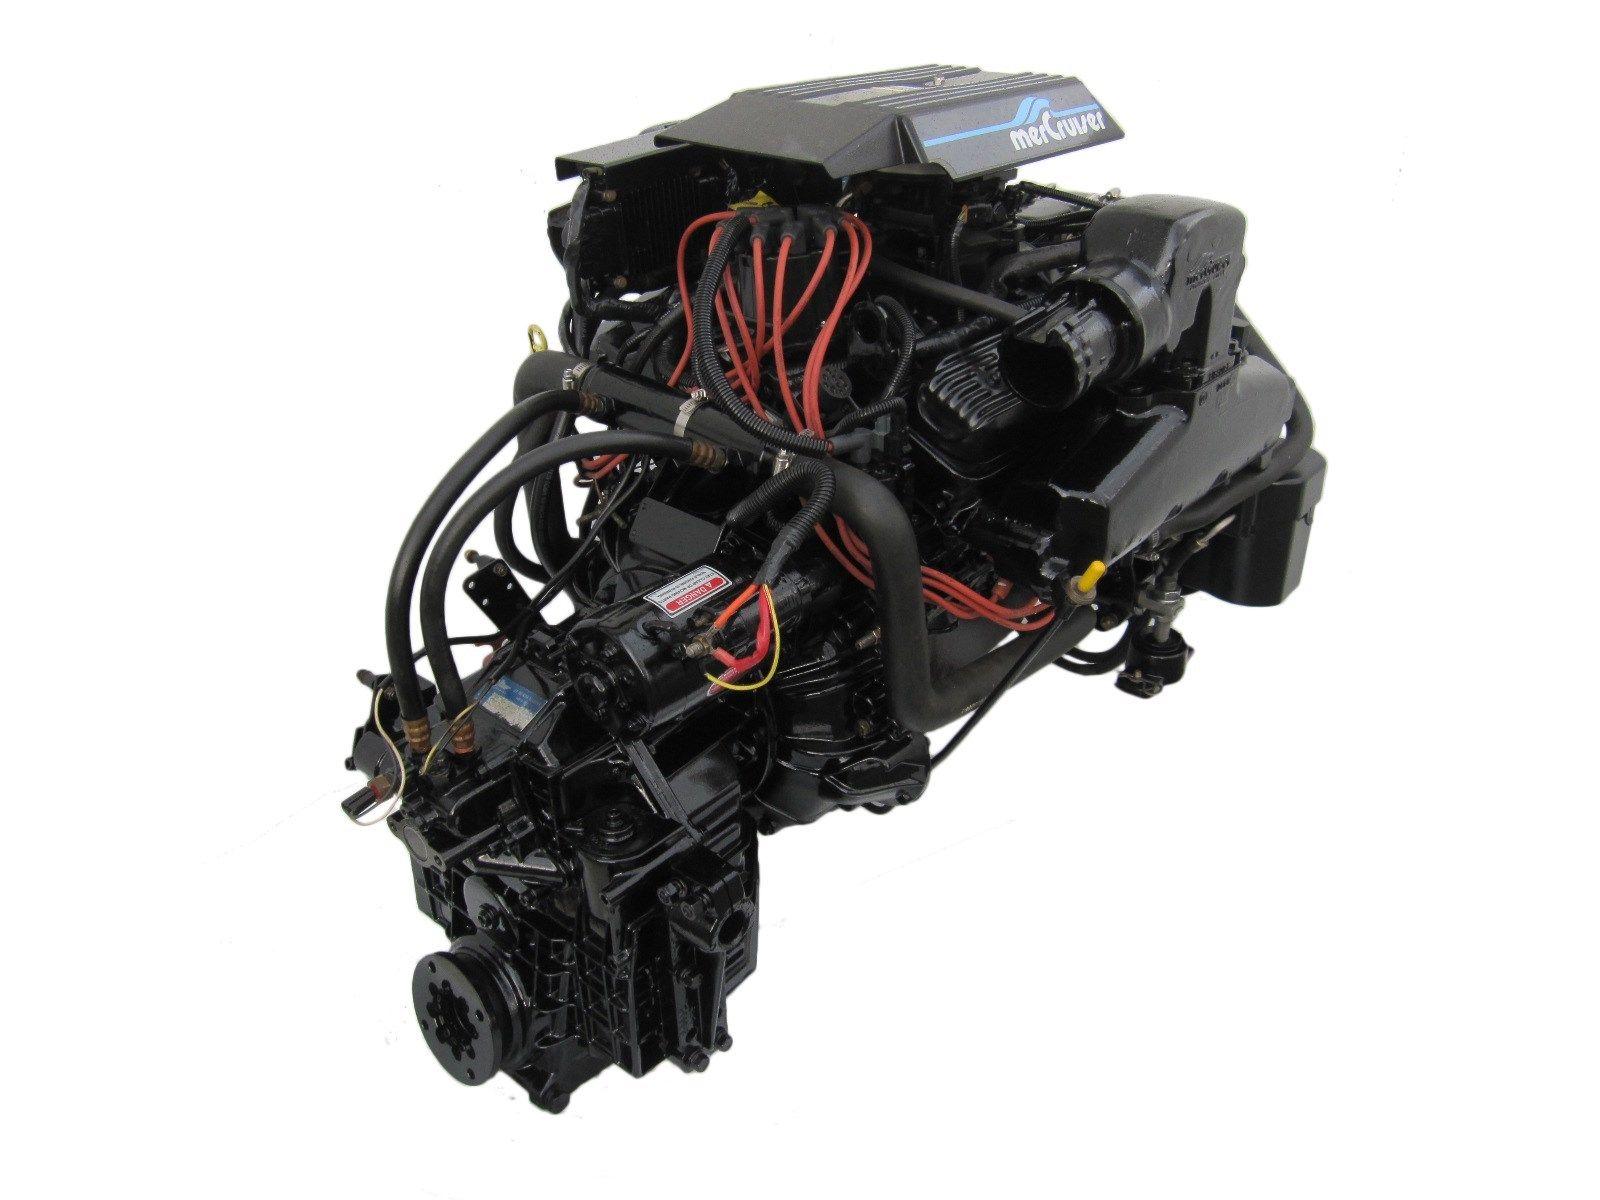 Mercruiser 57L Bluewater EFI Motor Inboard Boat Engine ZF